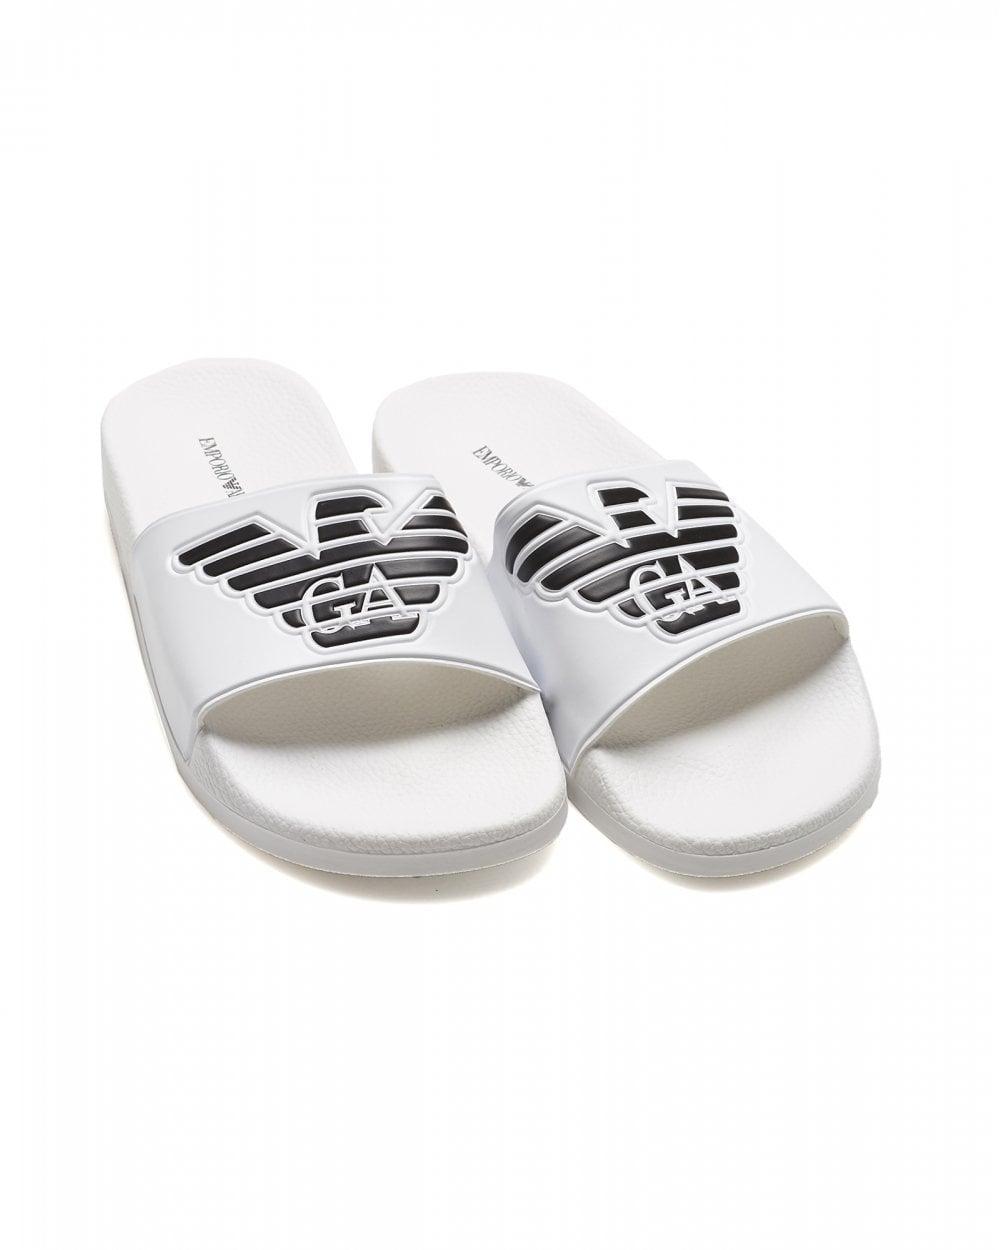 6eb83460a Emporio Armani Mens Eagle Logo Sliders, White Flip Flops